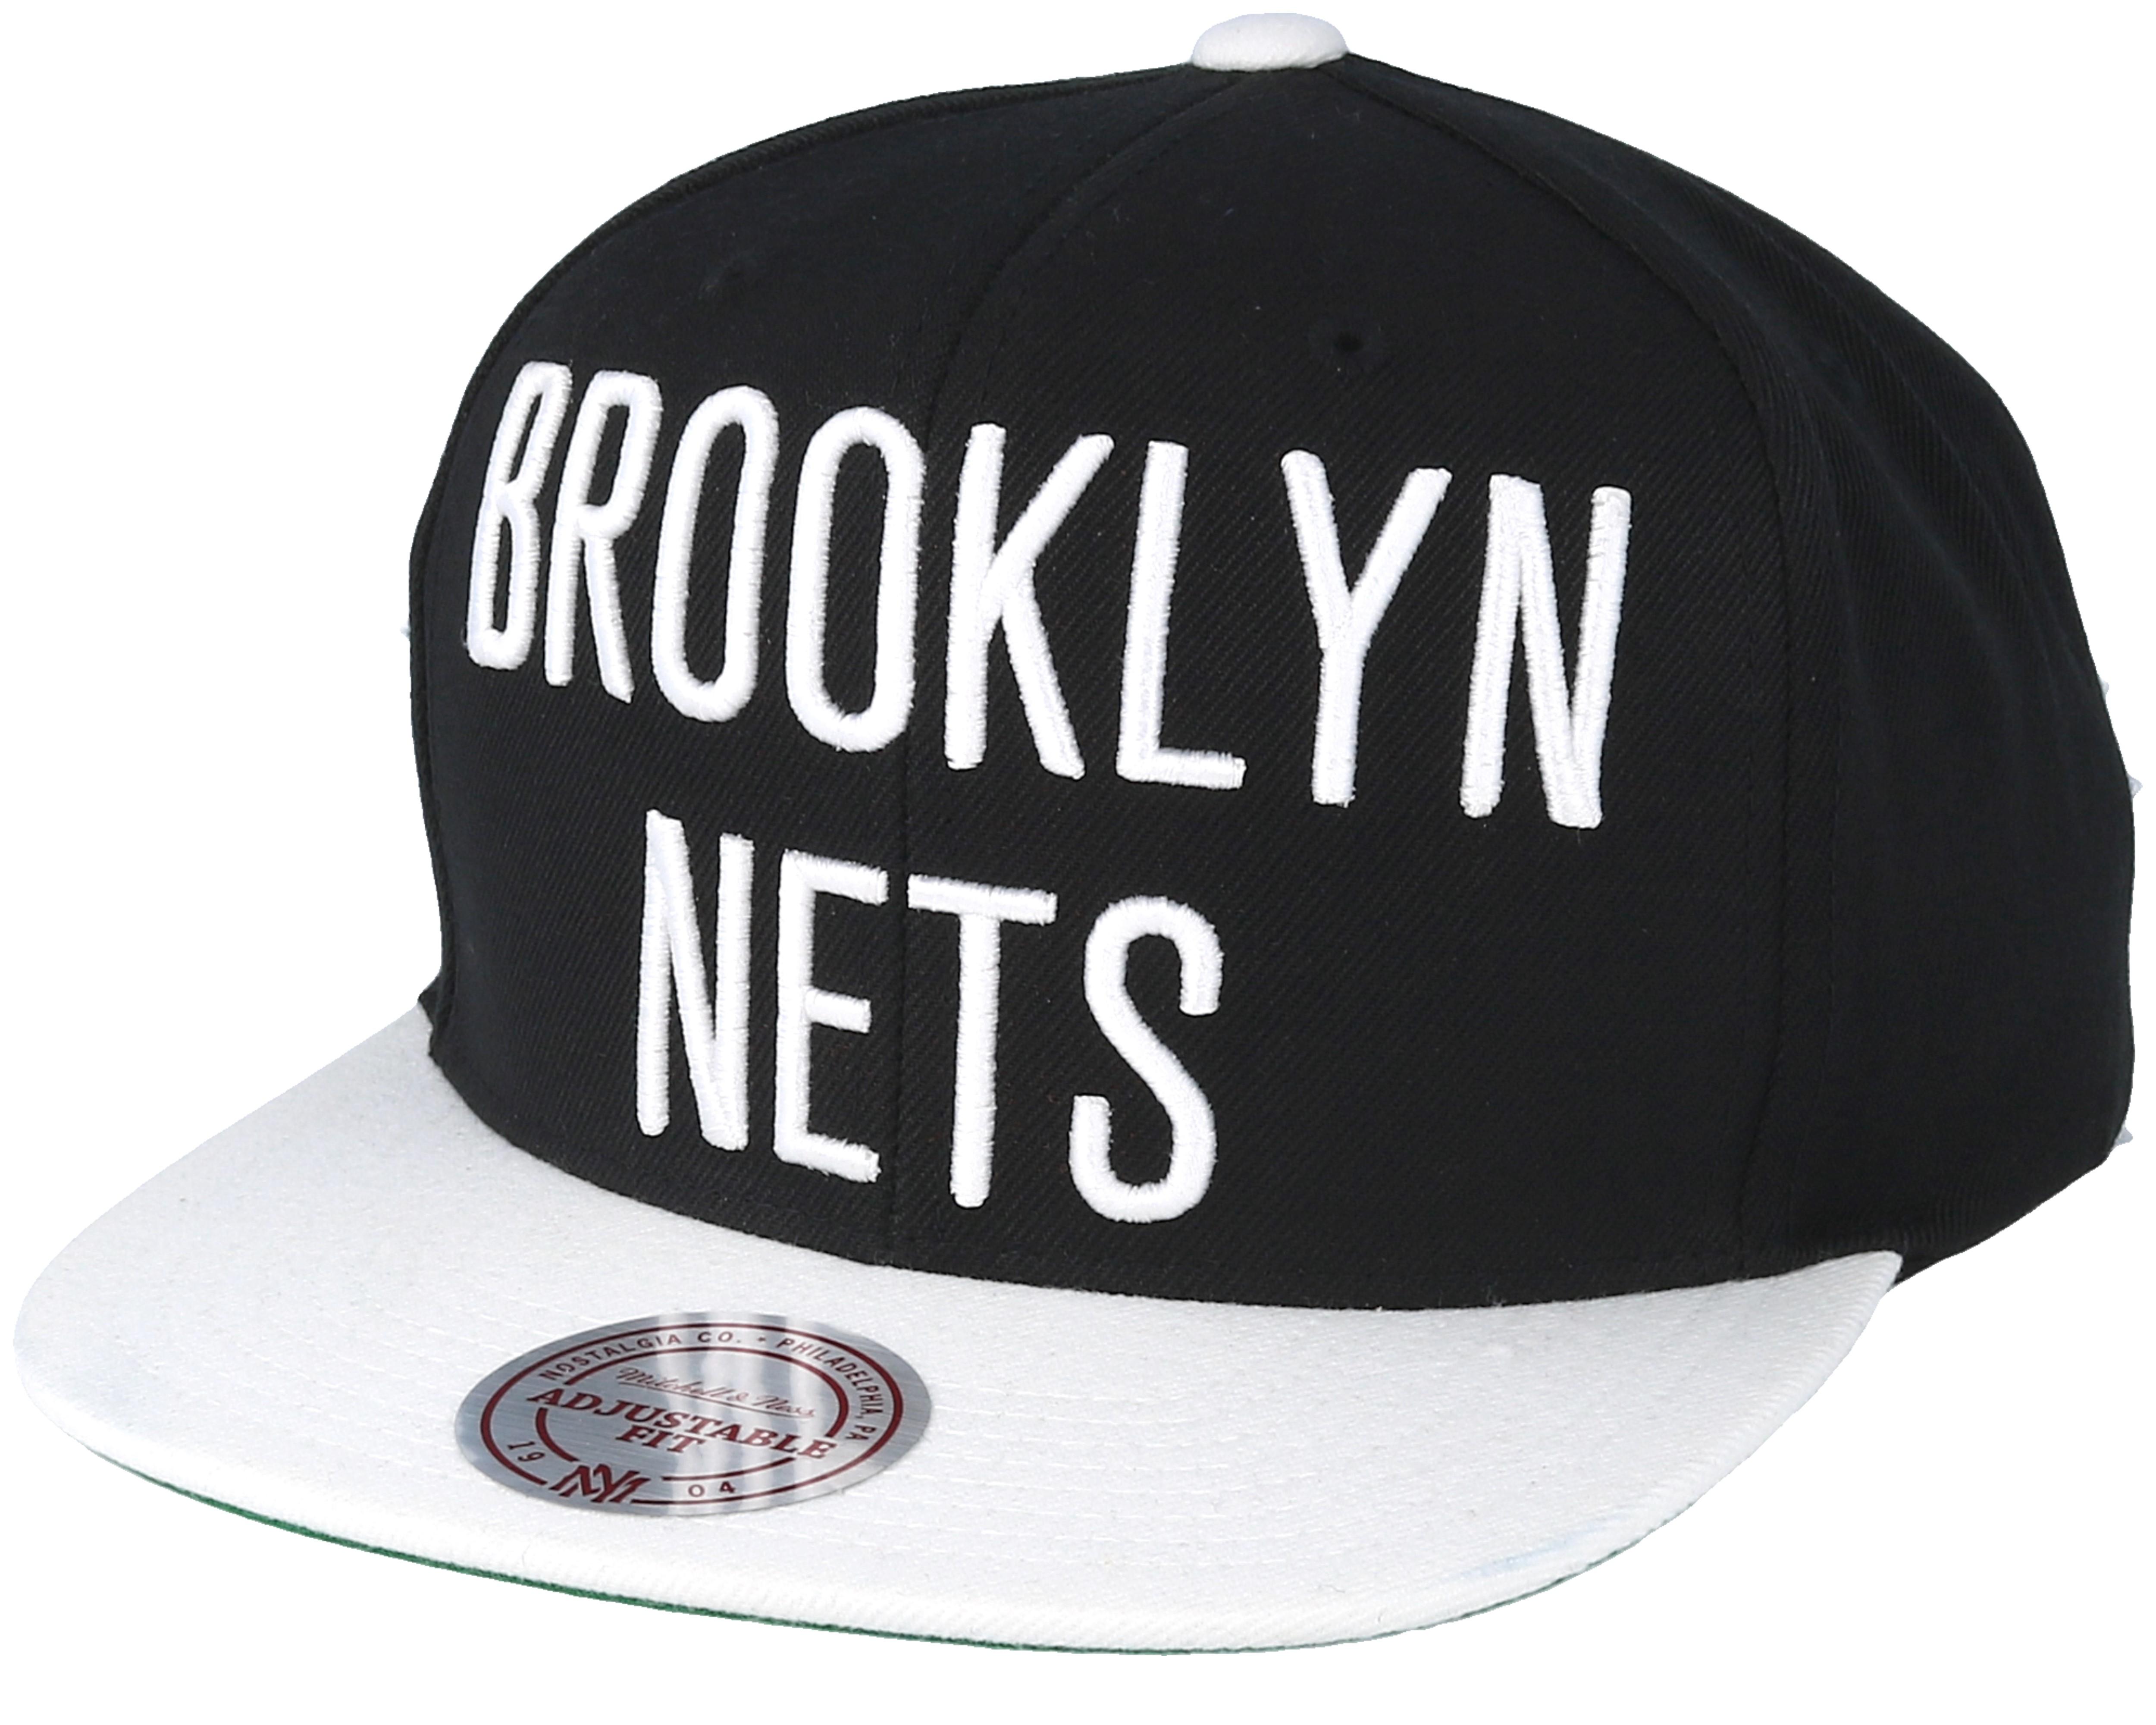 Brooklyn Nets XL Logo Black Snapback - Mitchell   Ness caps ... b9b42a5ea6d